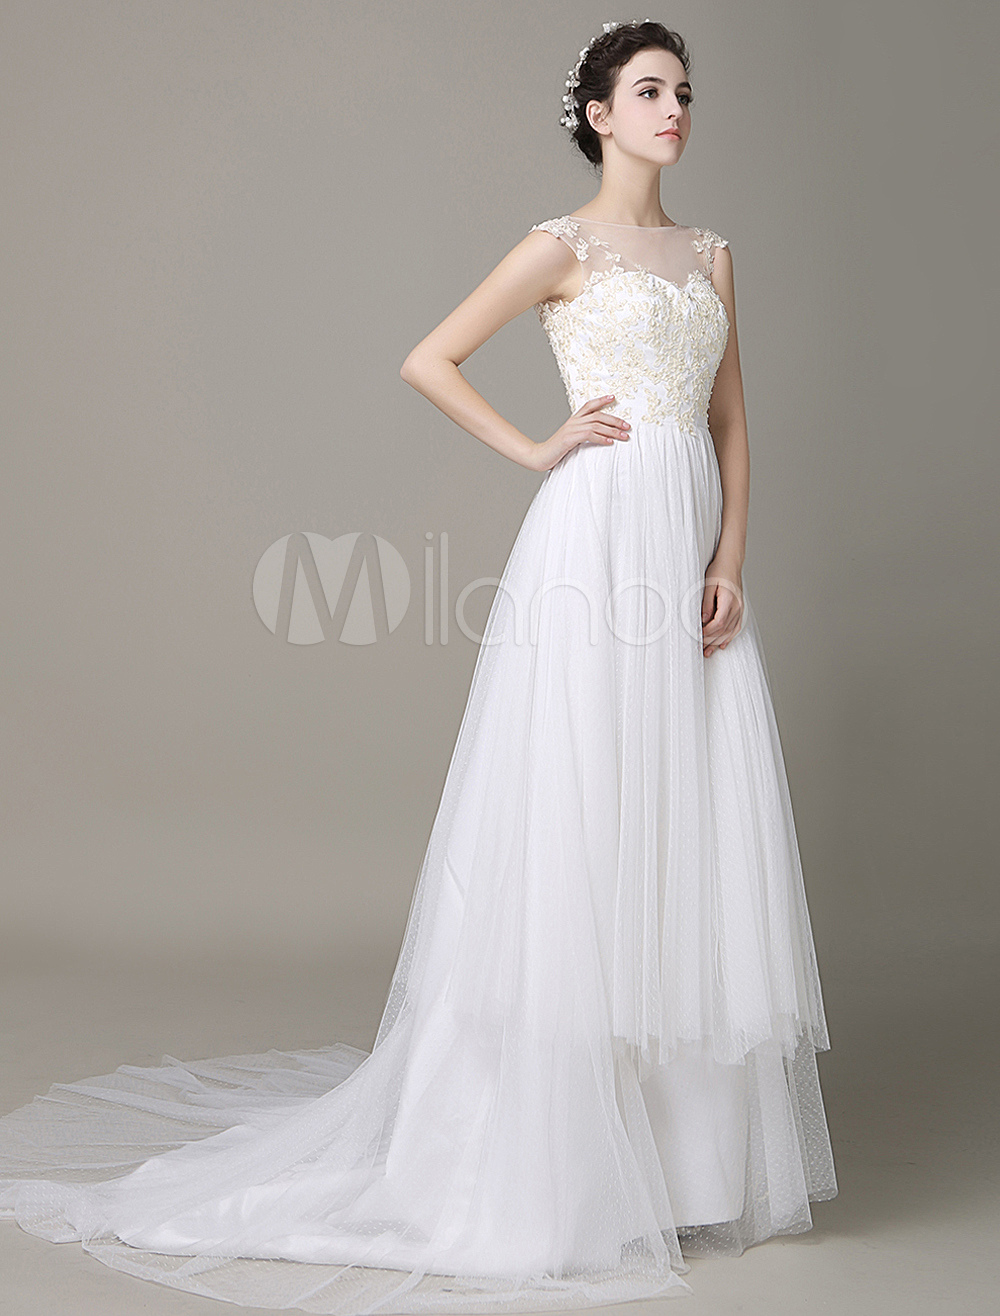 robe de mariage ivoire illusion backless hi rarchis